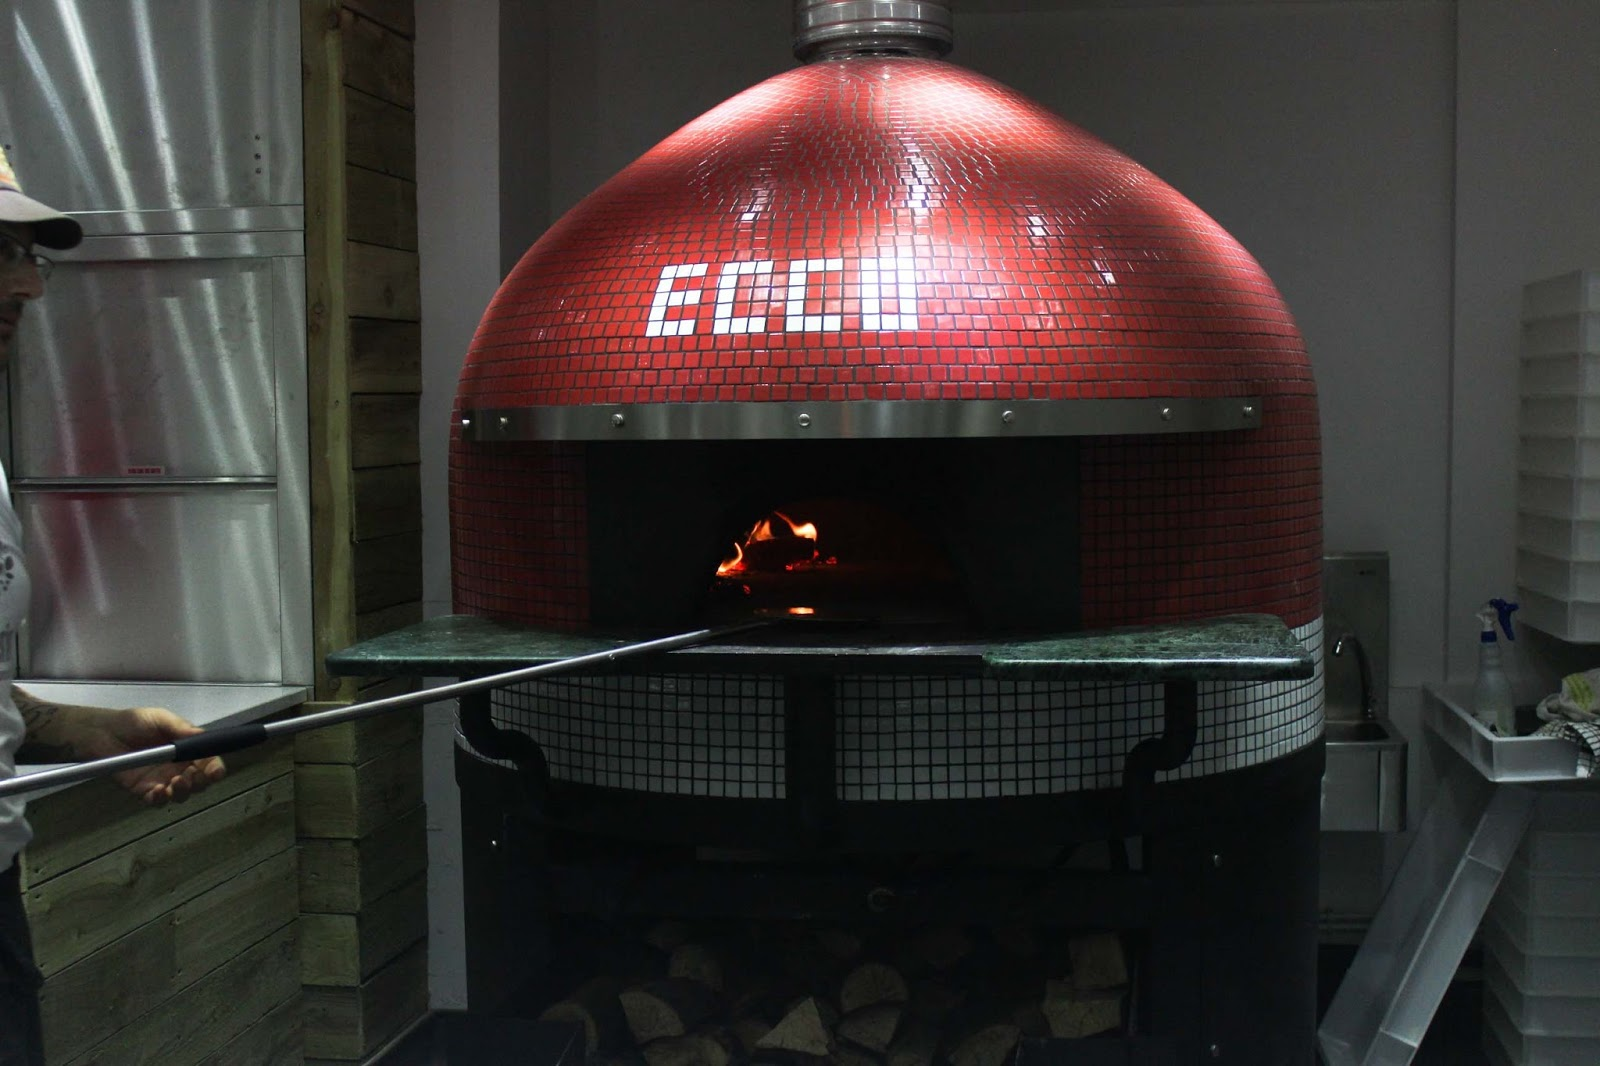 stone bake oven